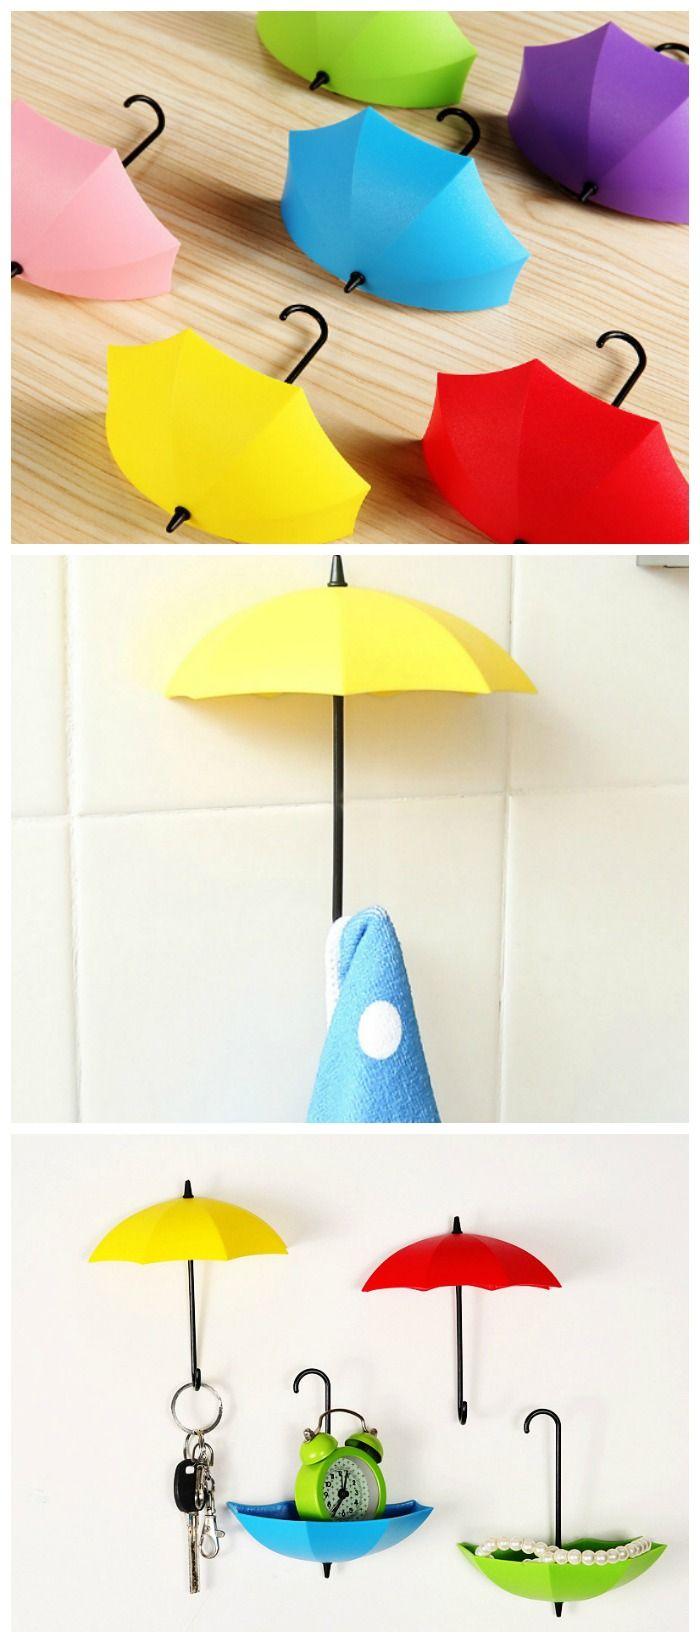 Umbrella Wall Hook | Home & Kitchen | Pinterest | Walls ...